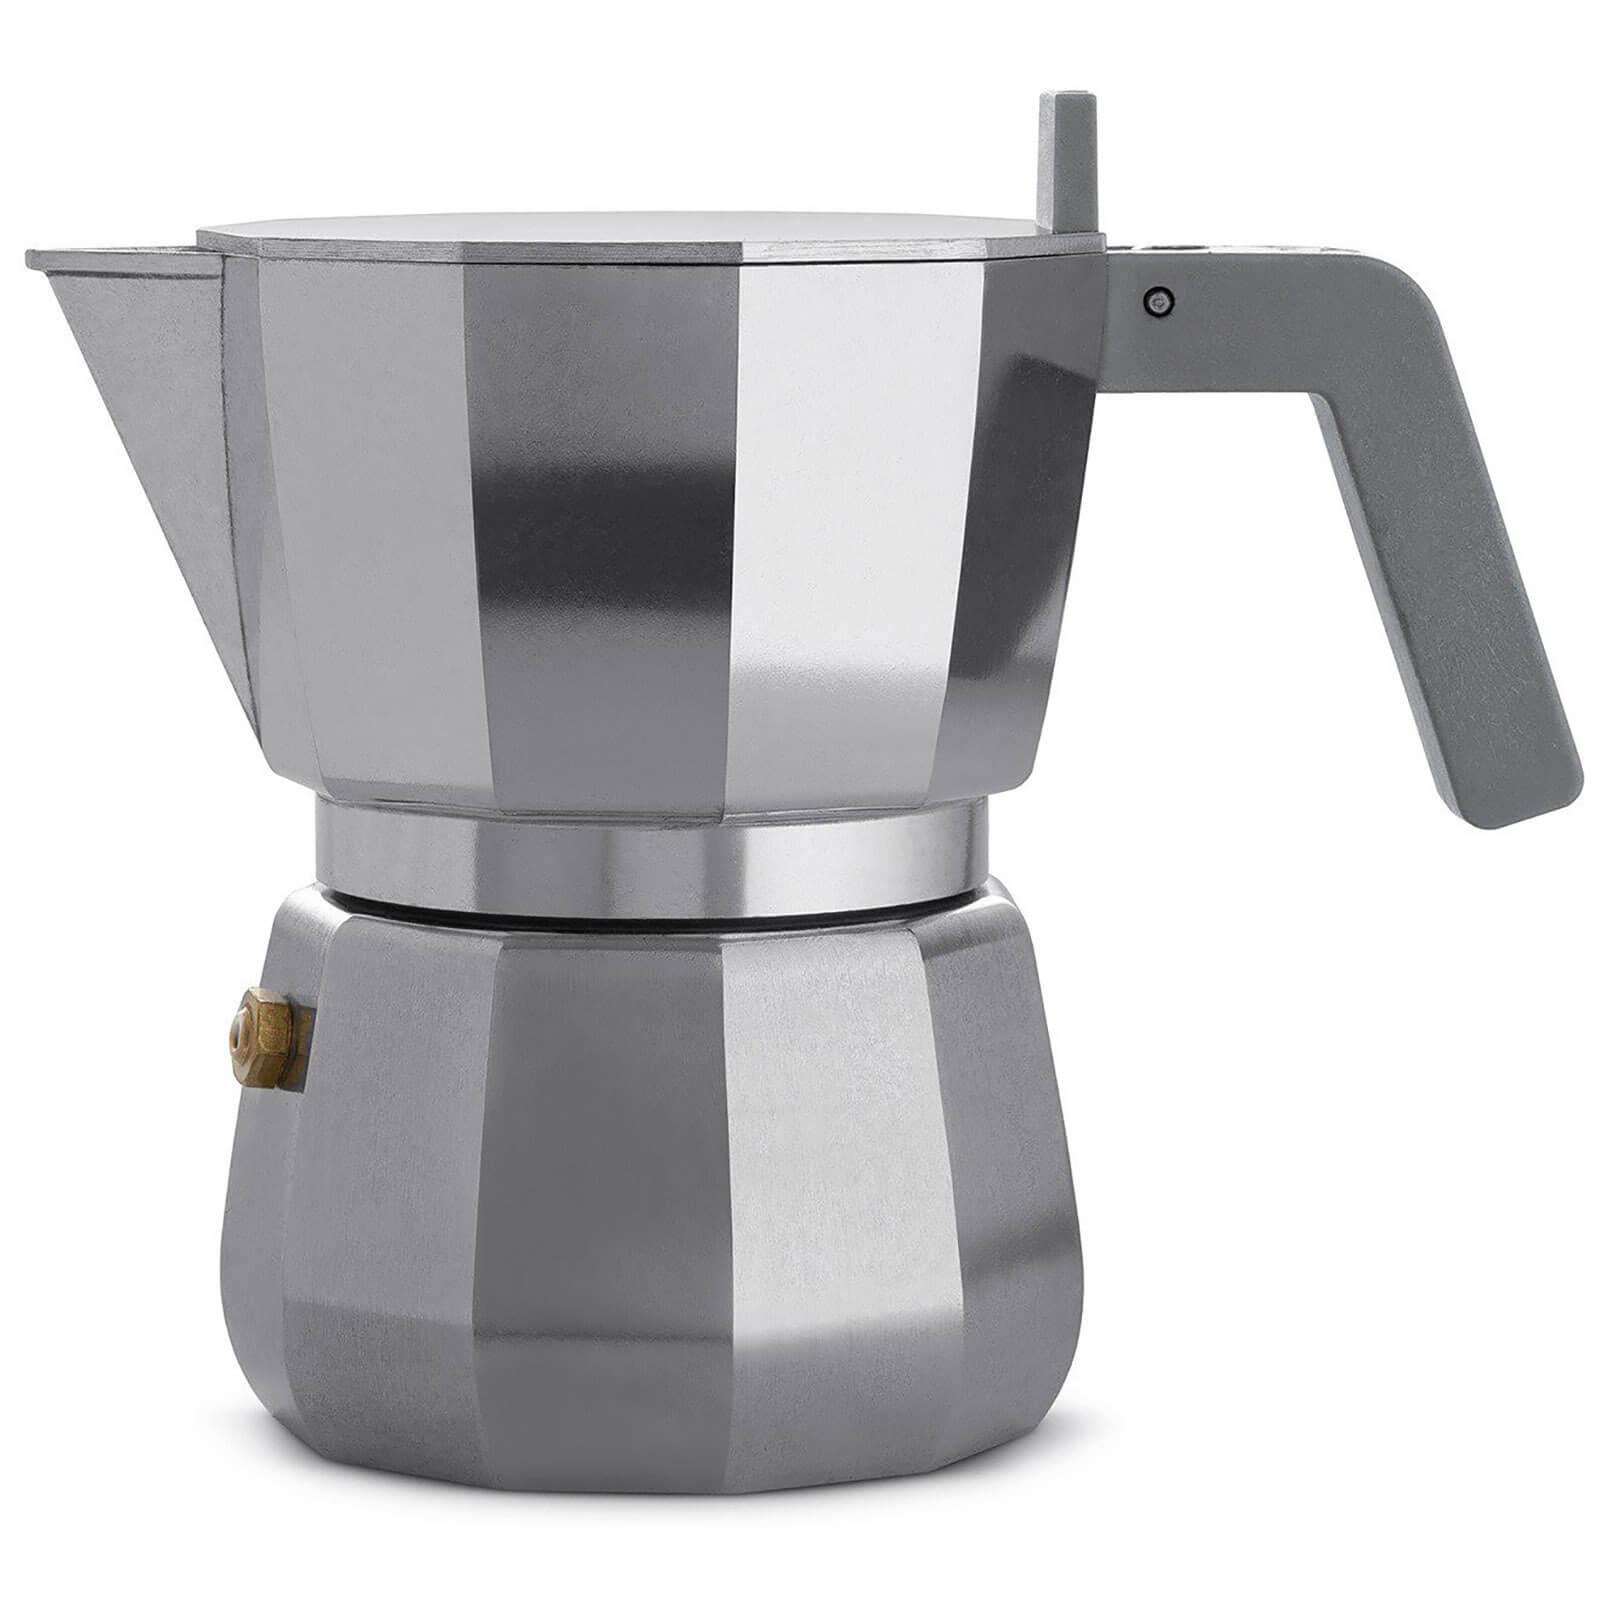 Alessi David Chipperfield 3 Cup Moka Espresso Maker